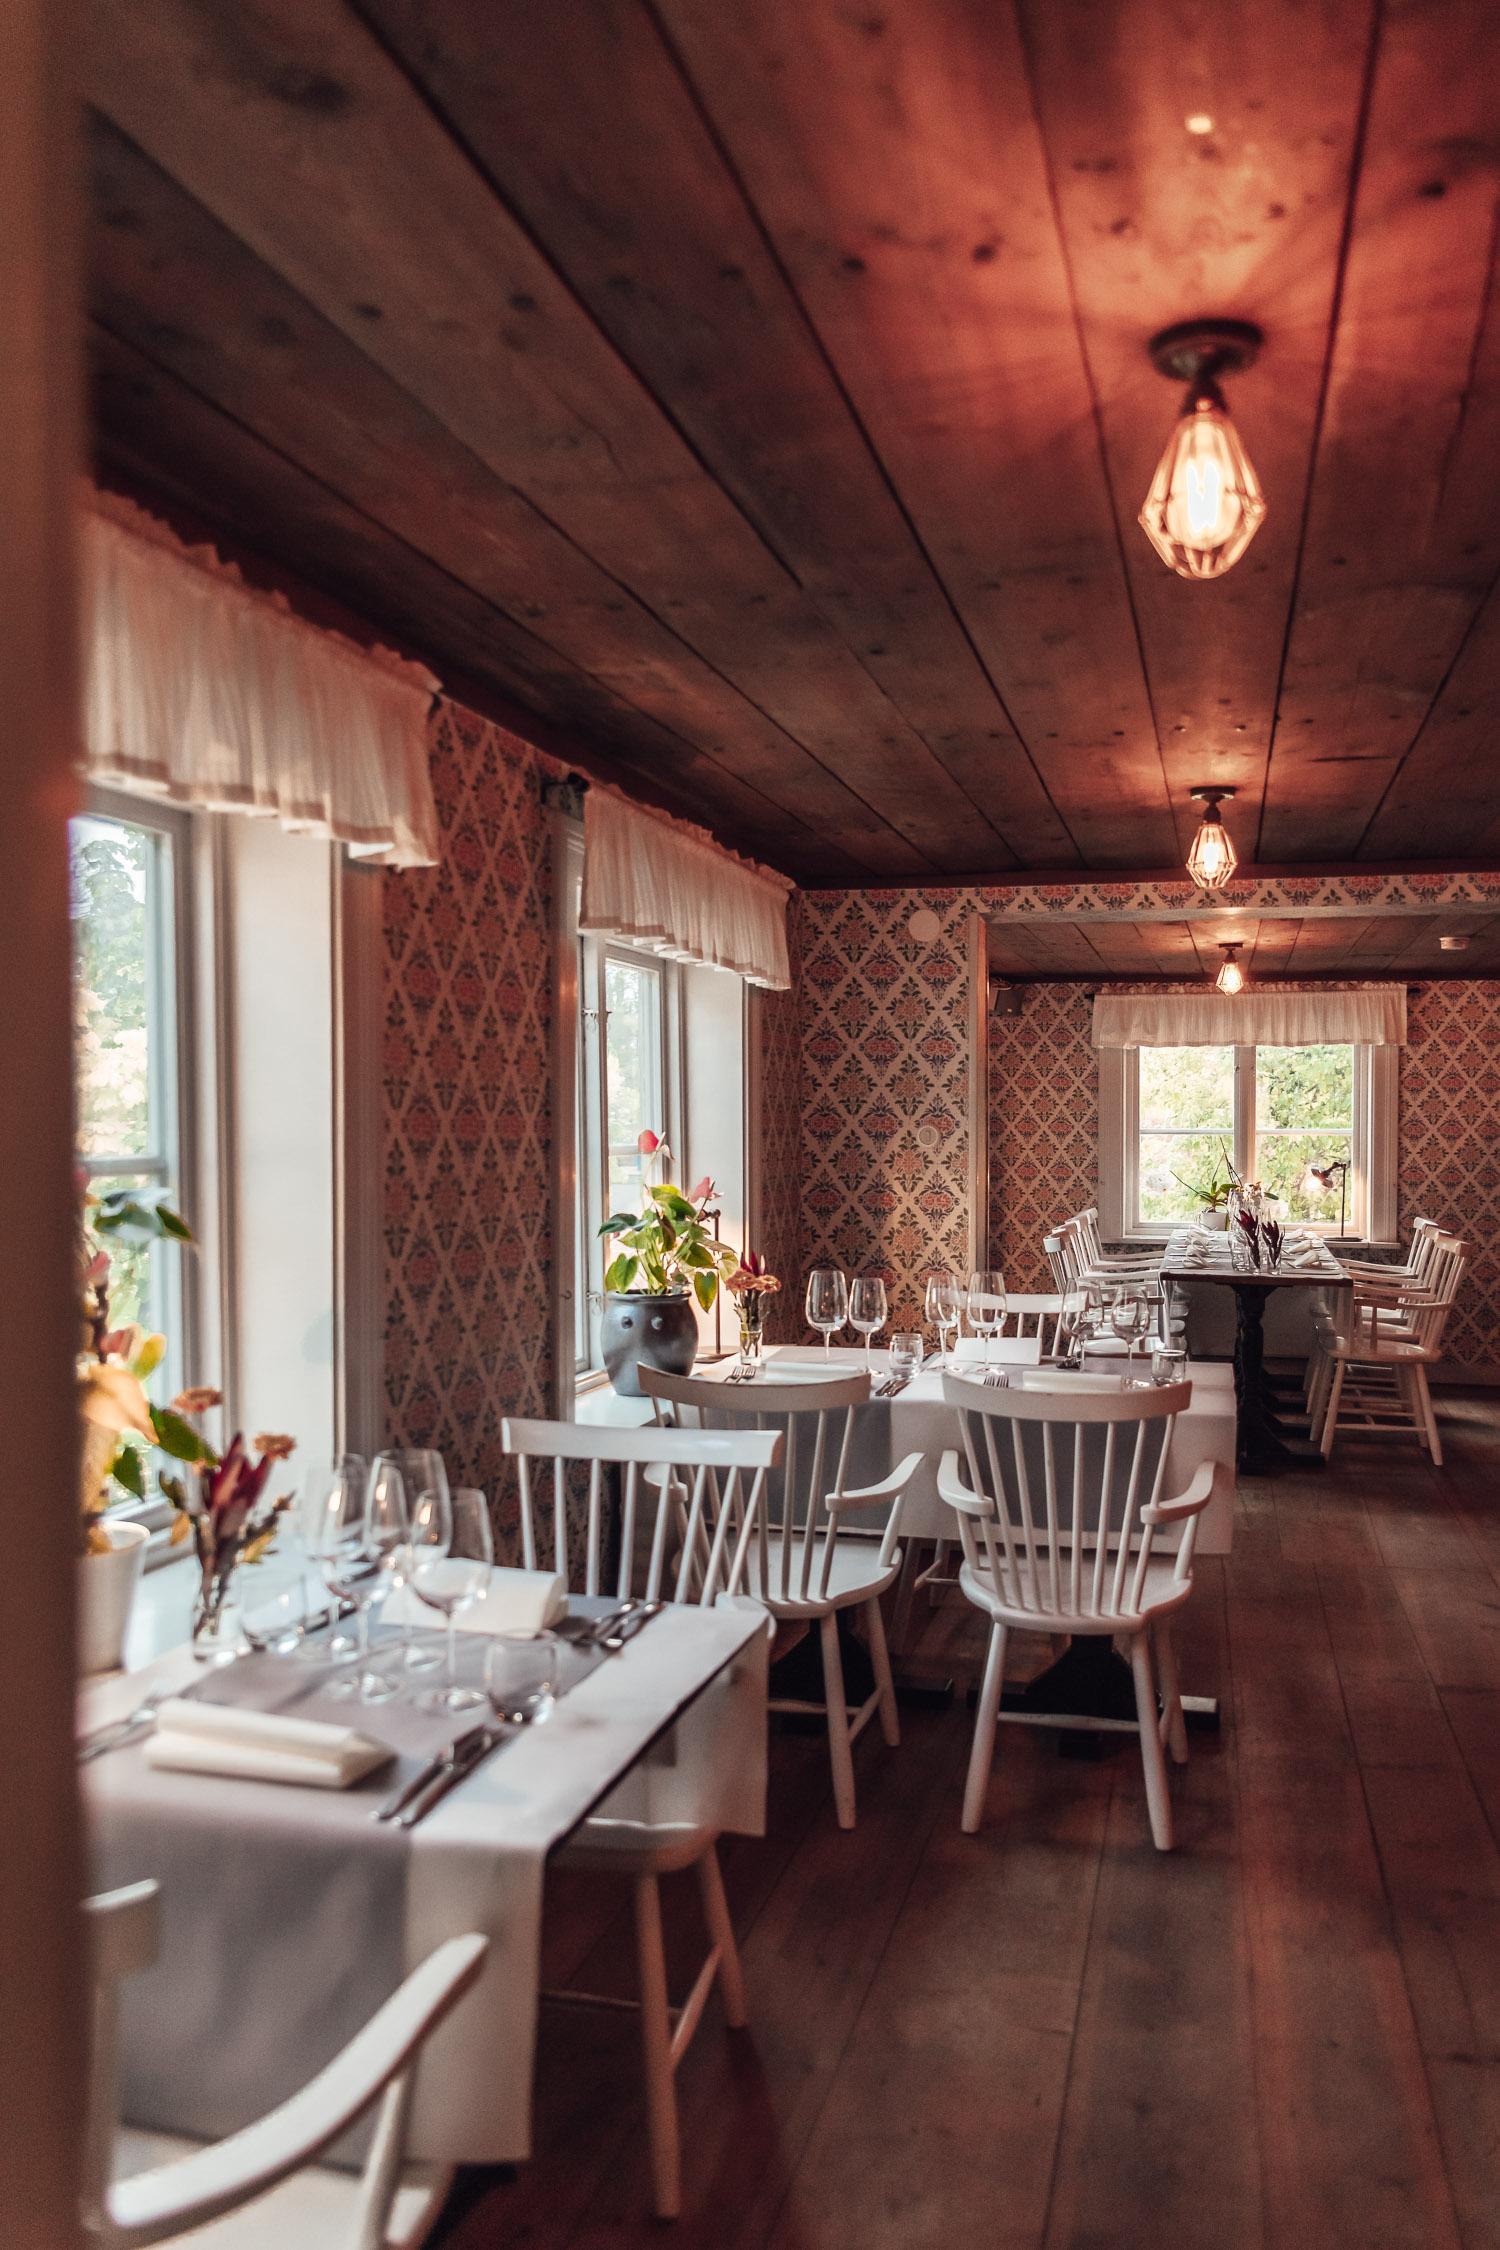 Mysigt café i Wadköping: Gamla Örebro Café & Konferens